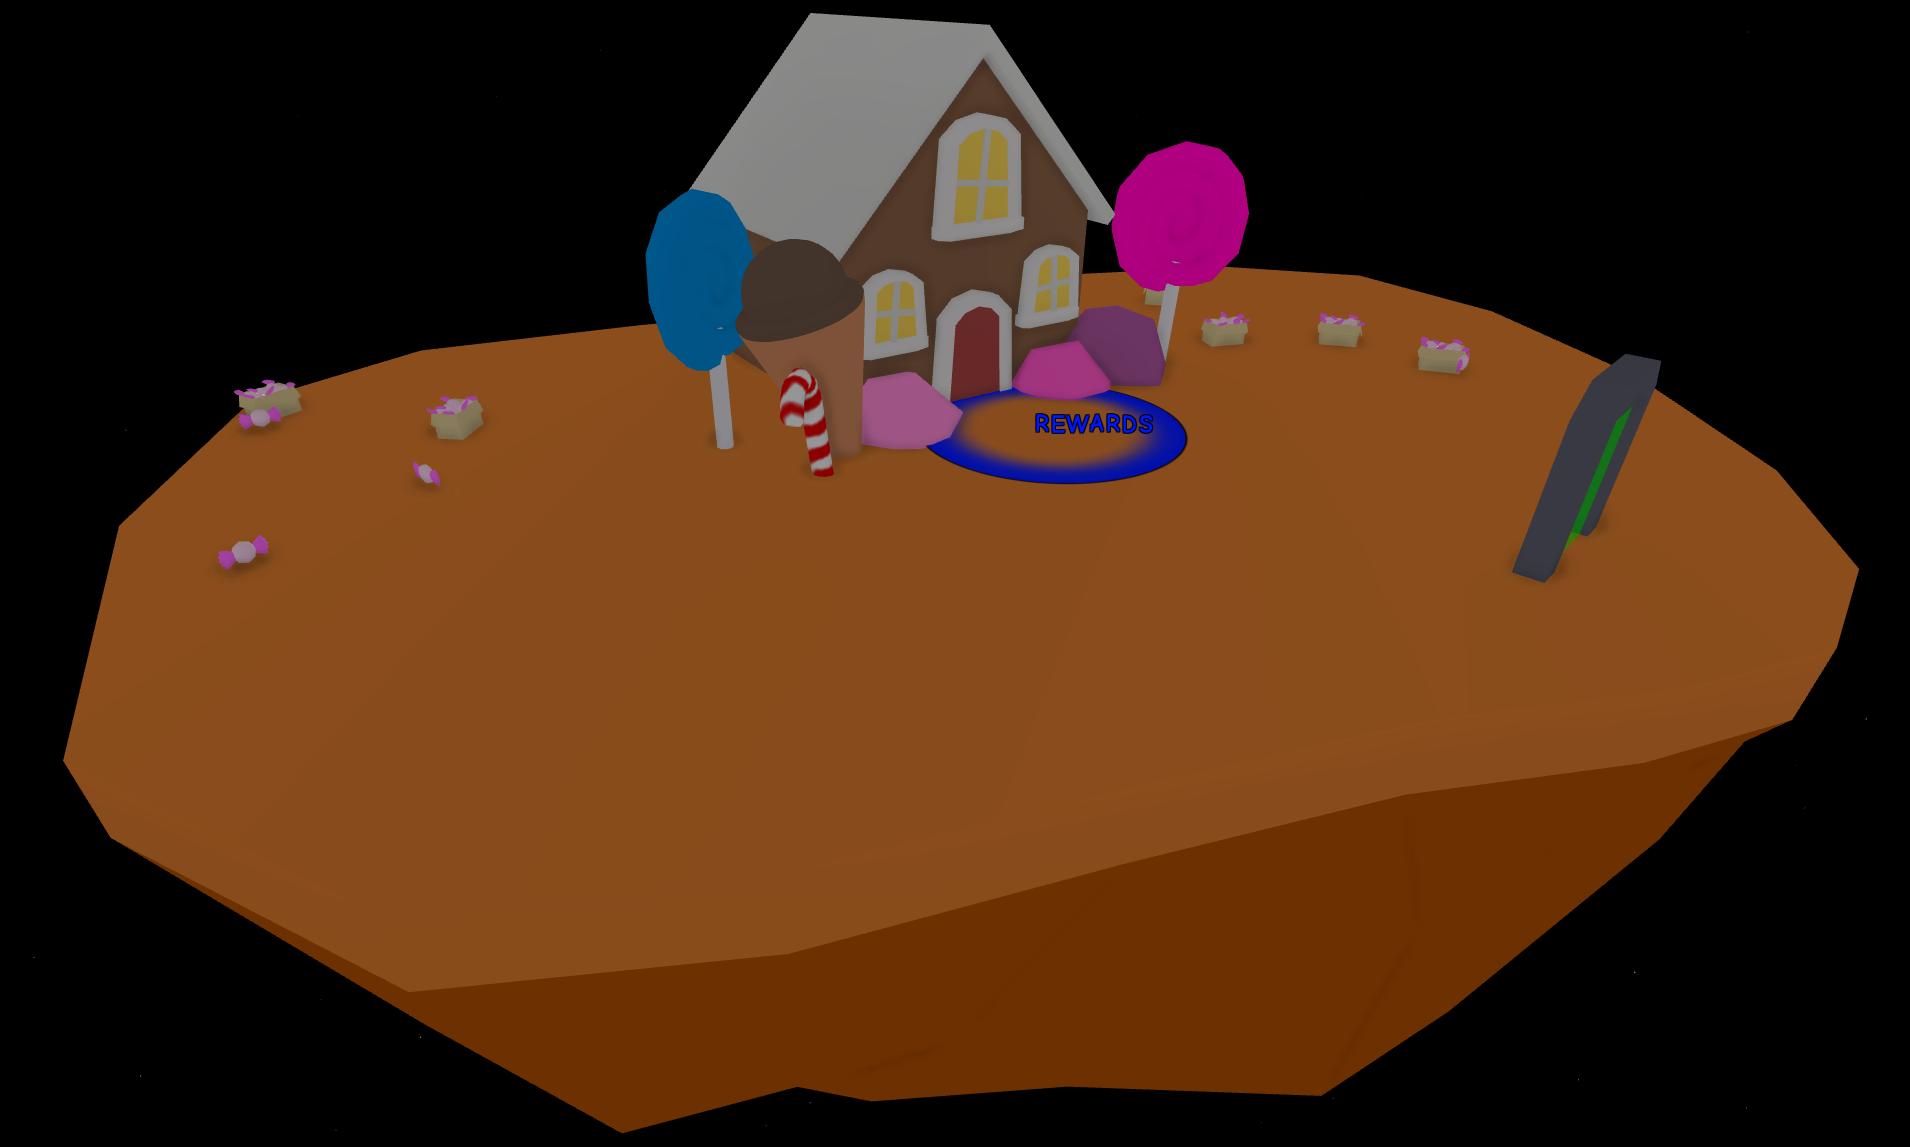 Rewards Island